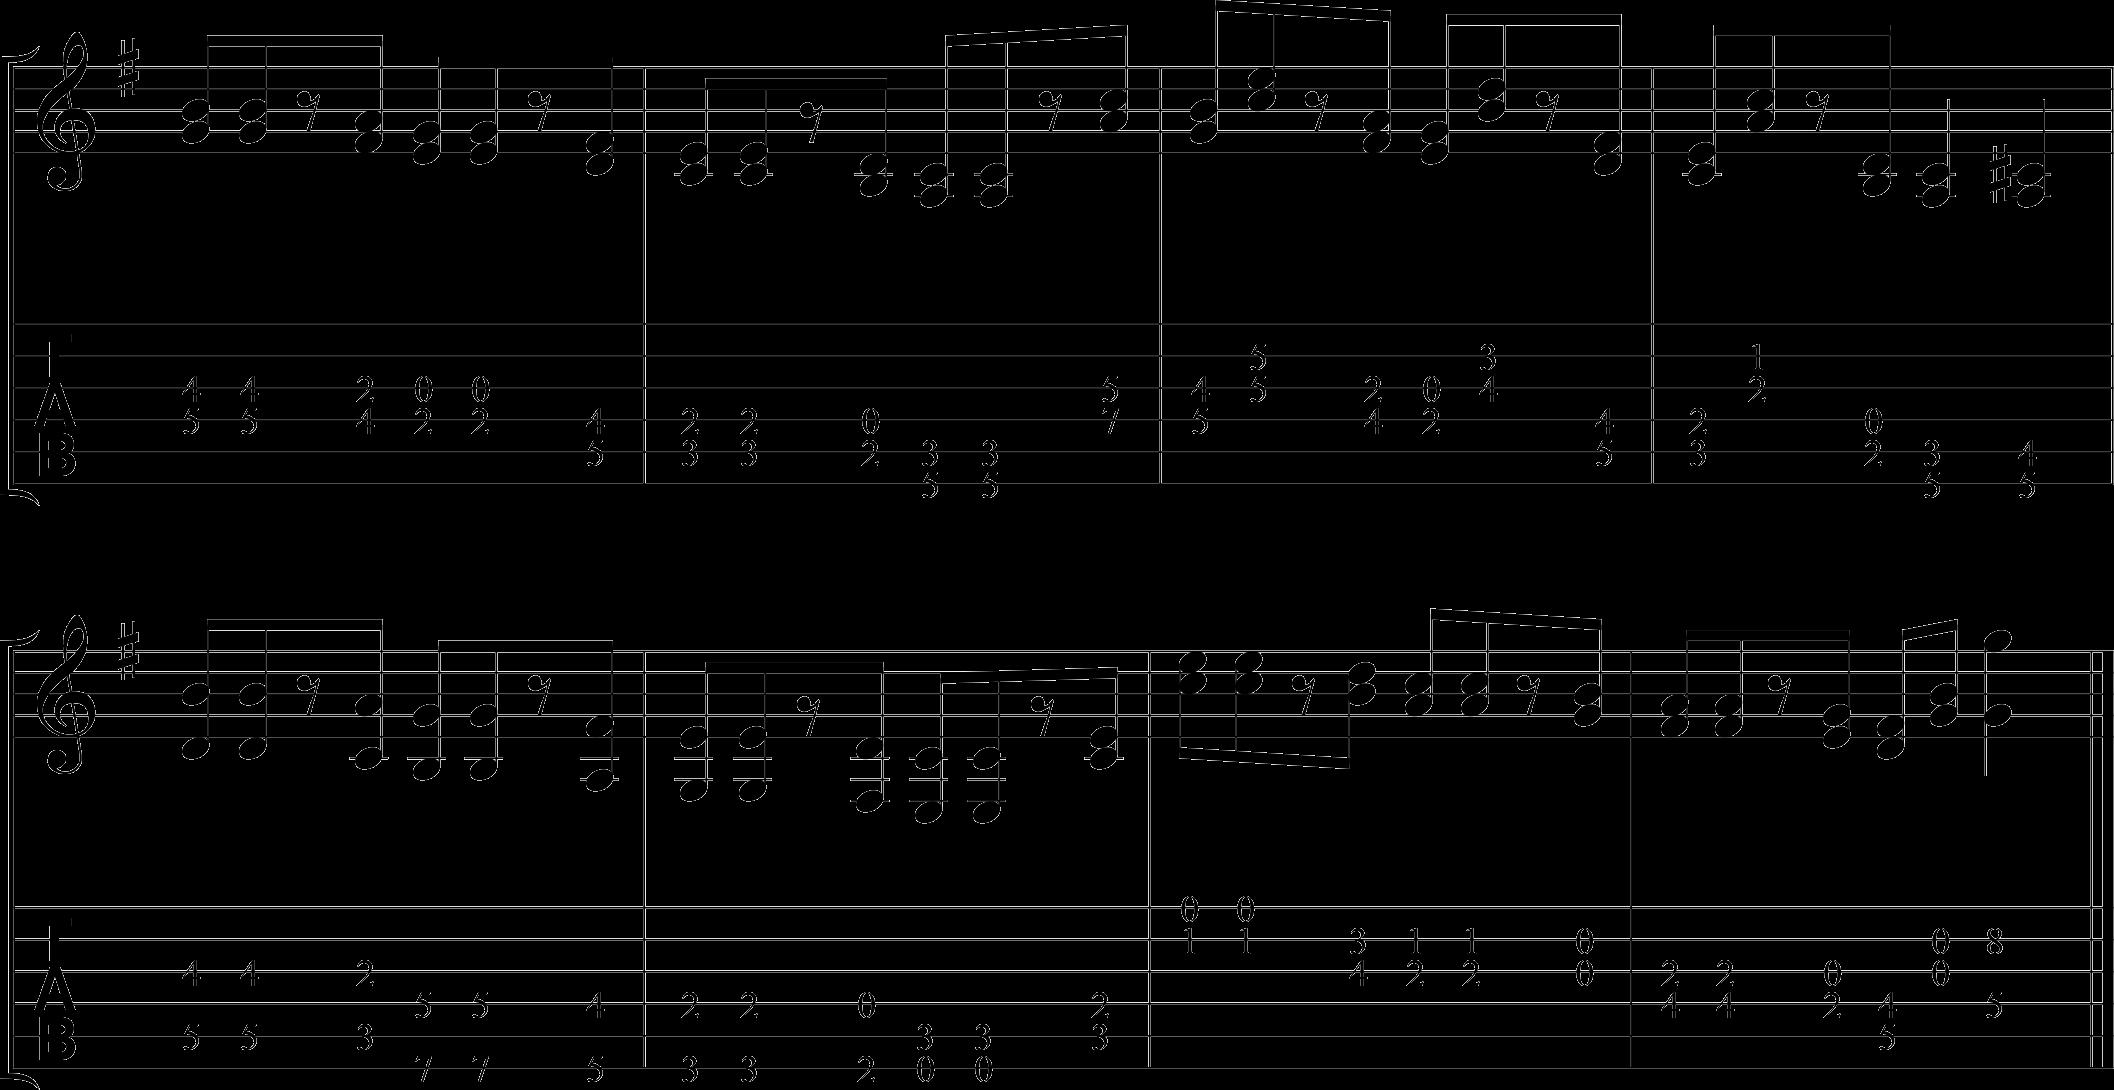 Double stop example--pentatonic scale.